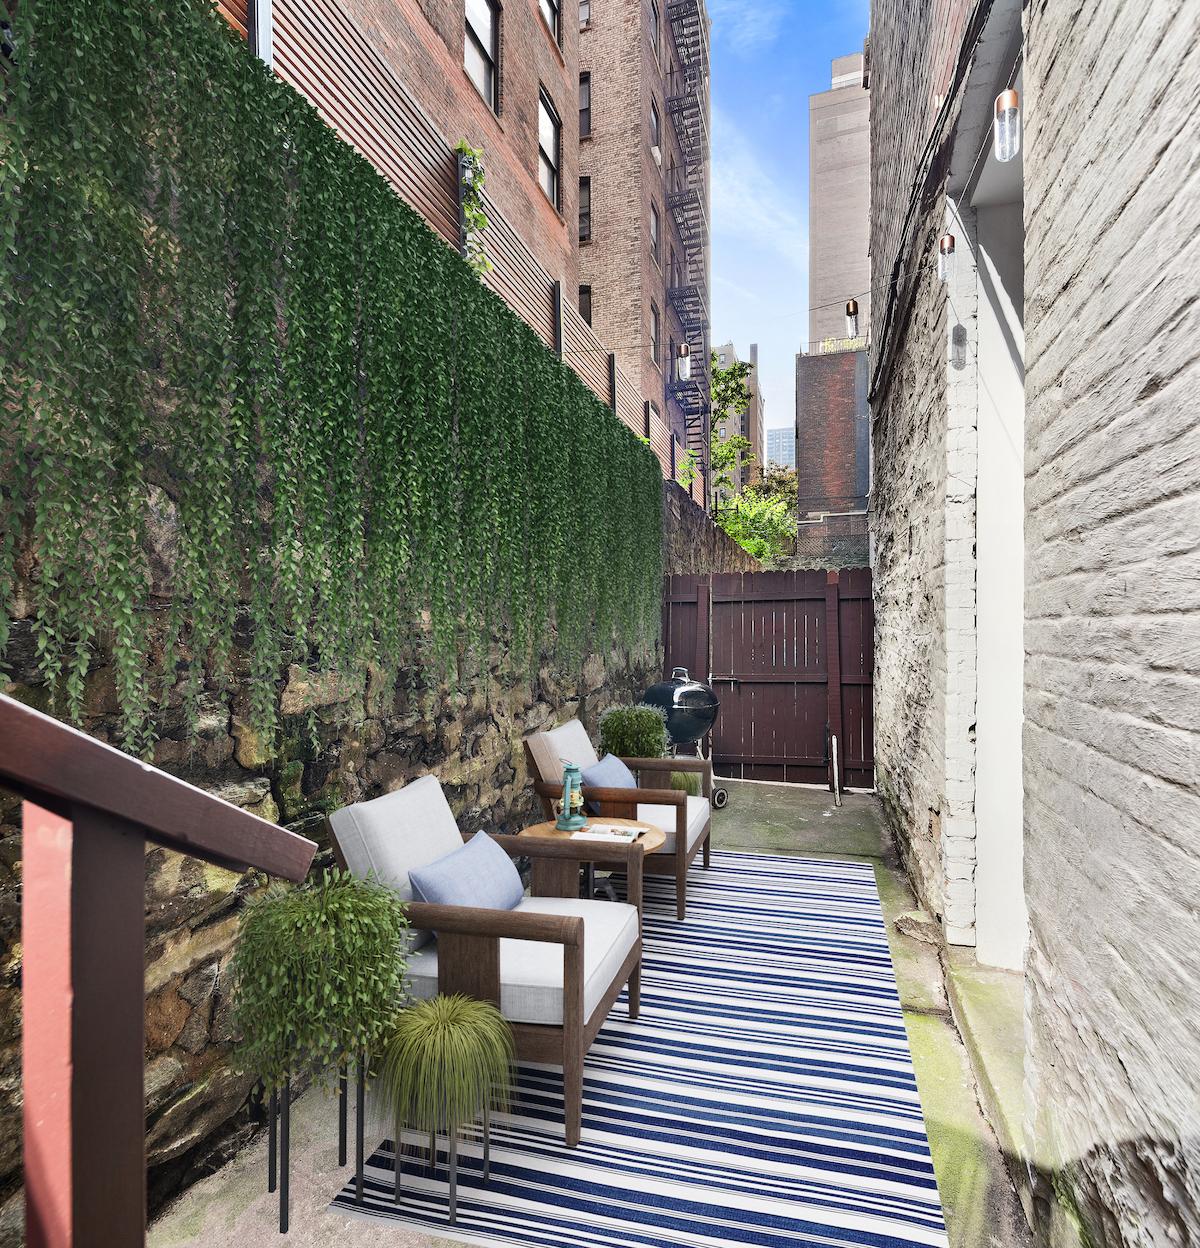 345 West 70th Street, Joe Namath, celebrities, cool listings, upper west side